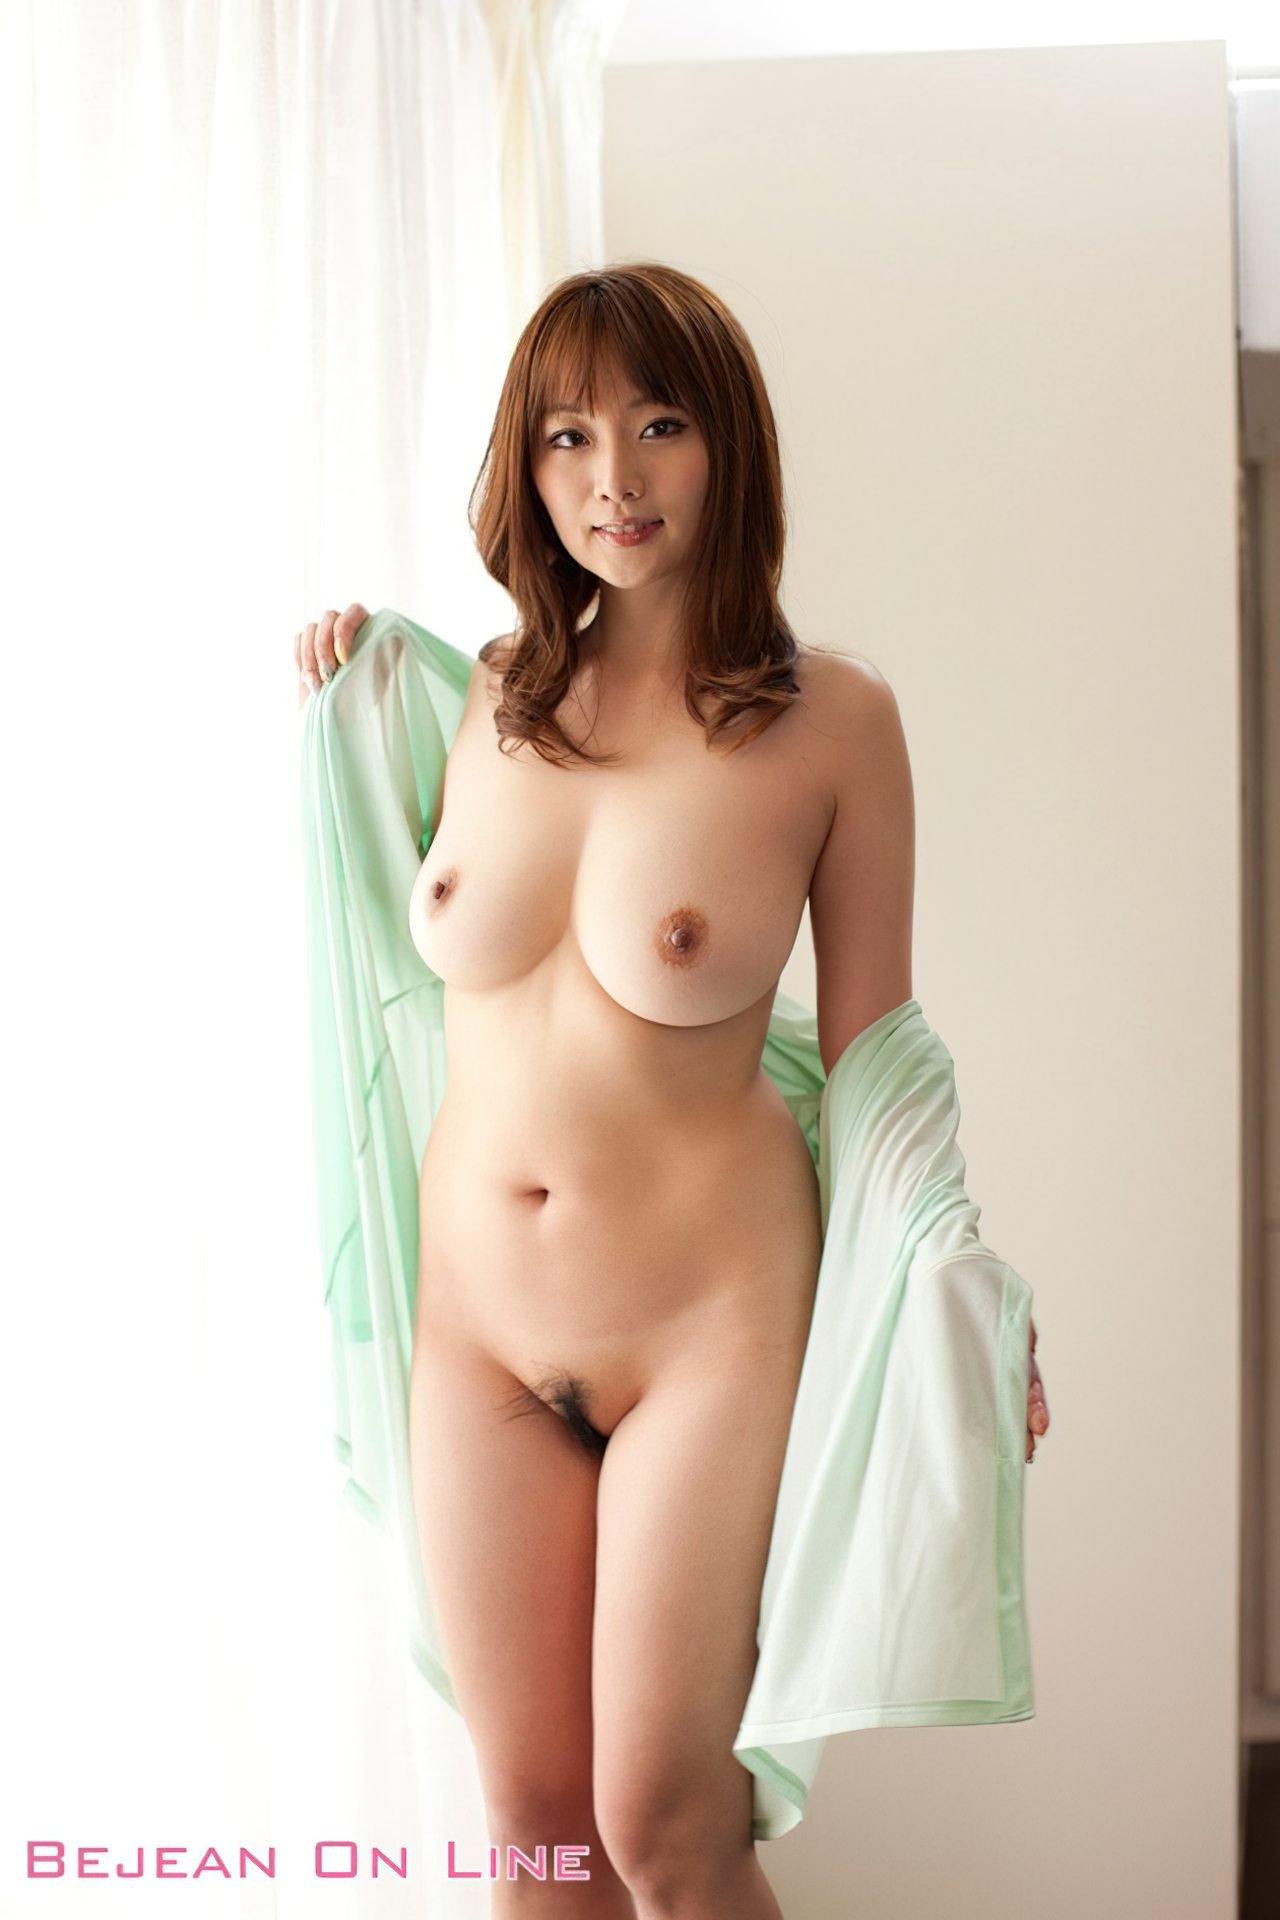 Japonesa Safada (8)